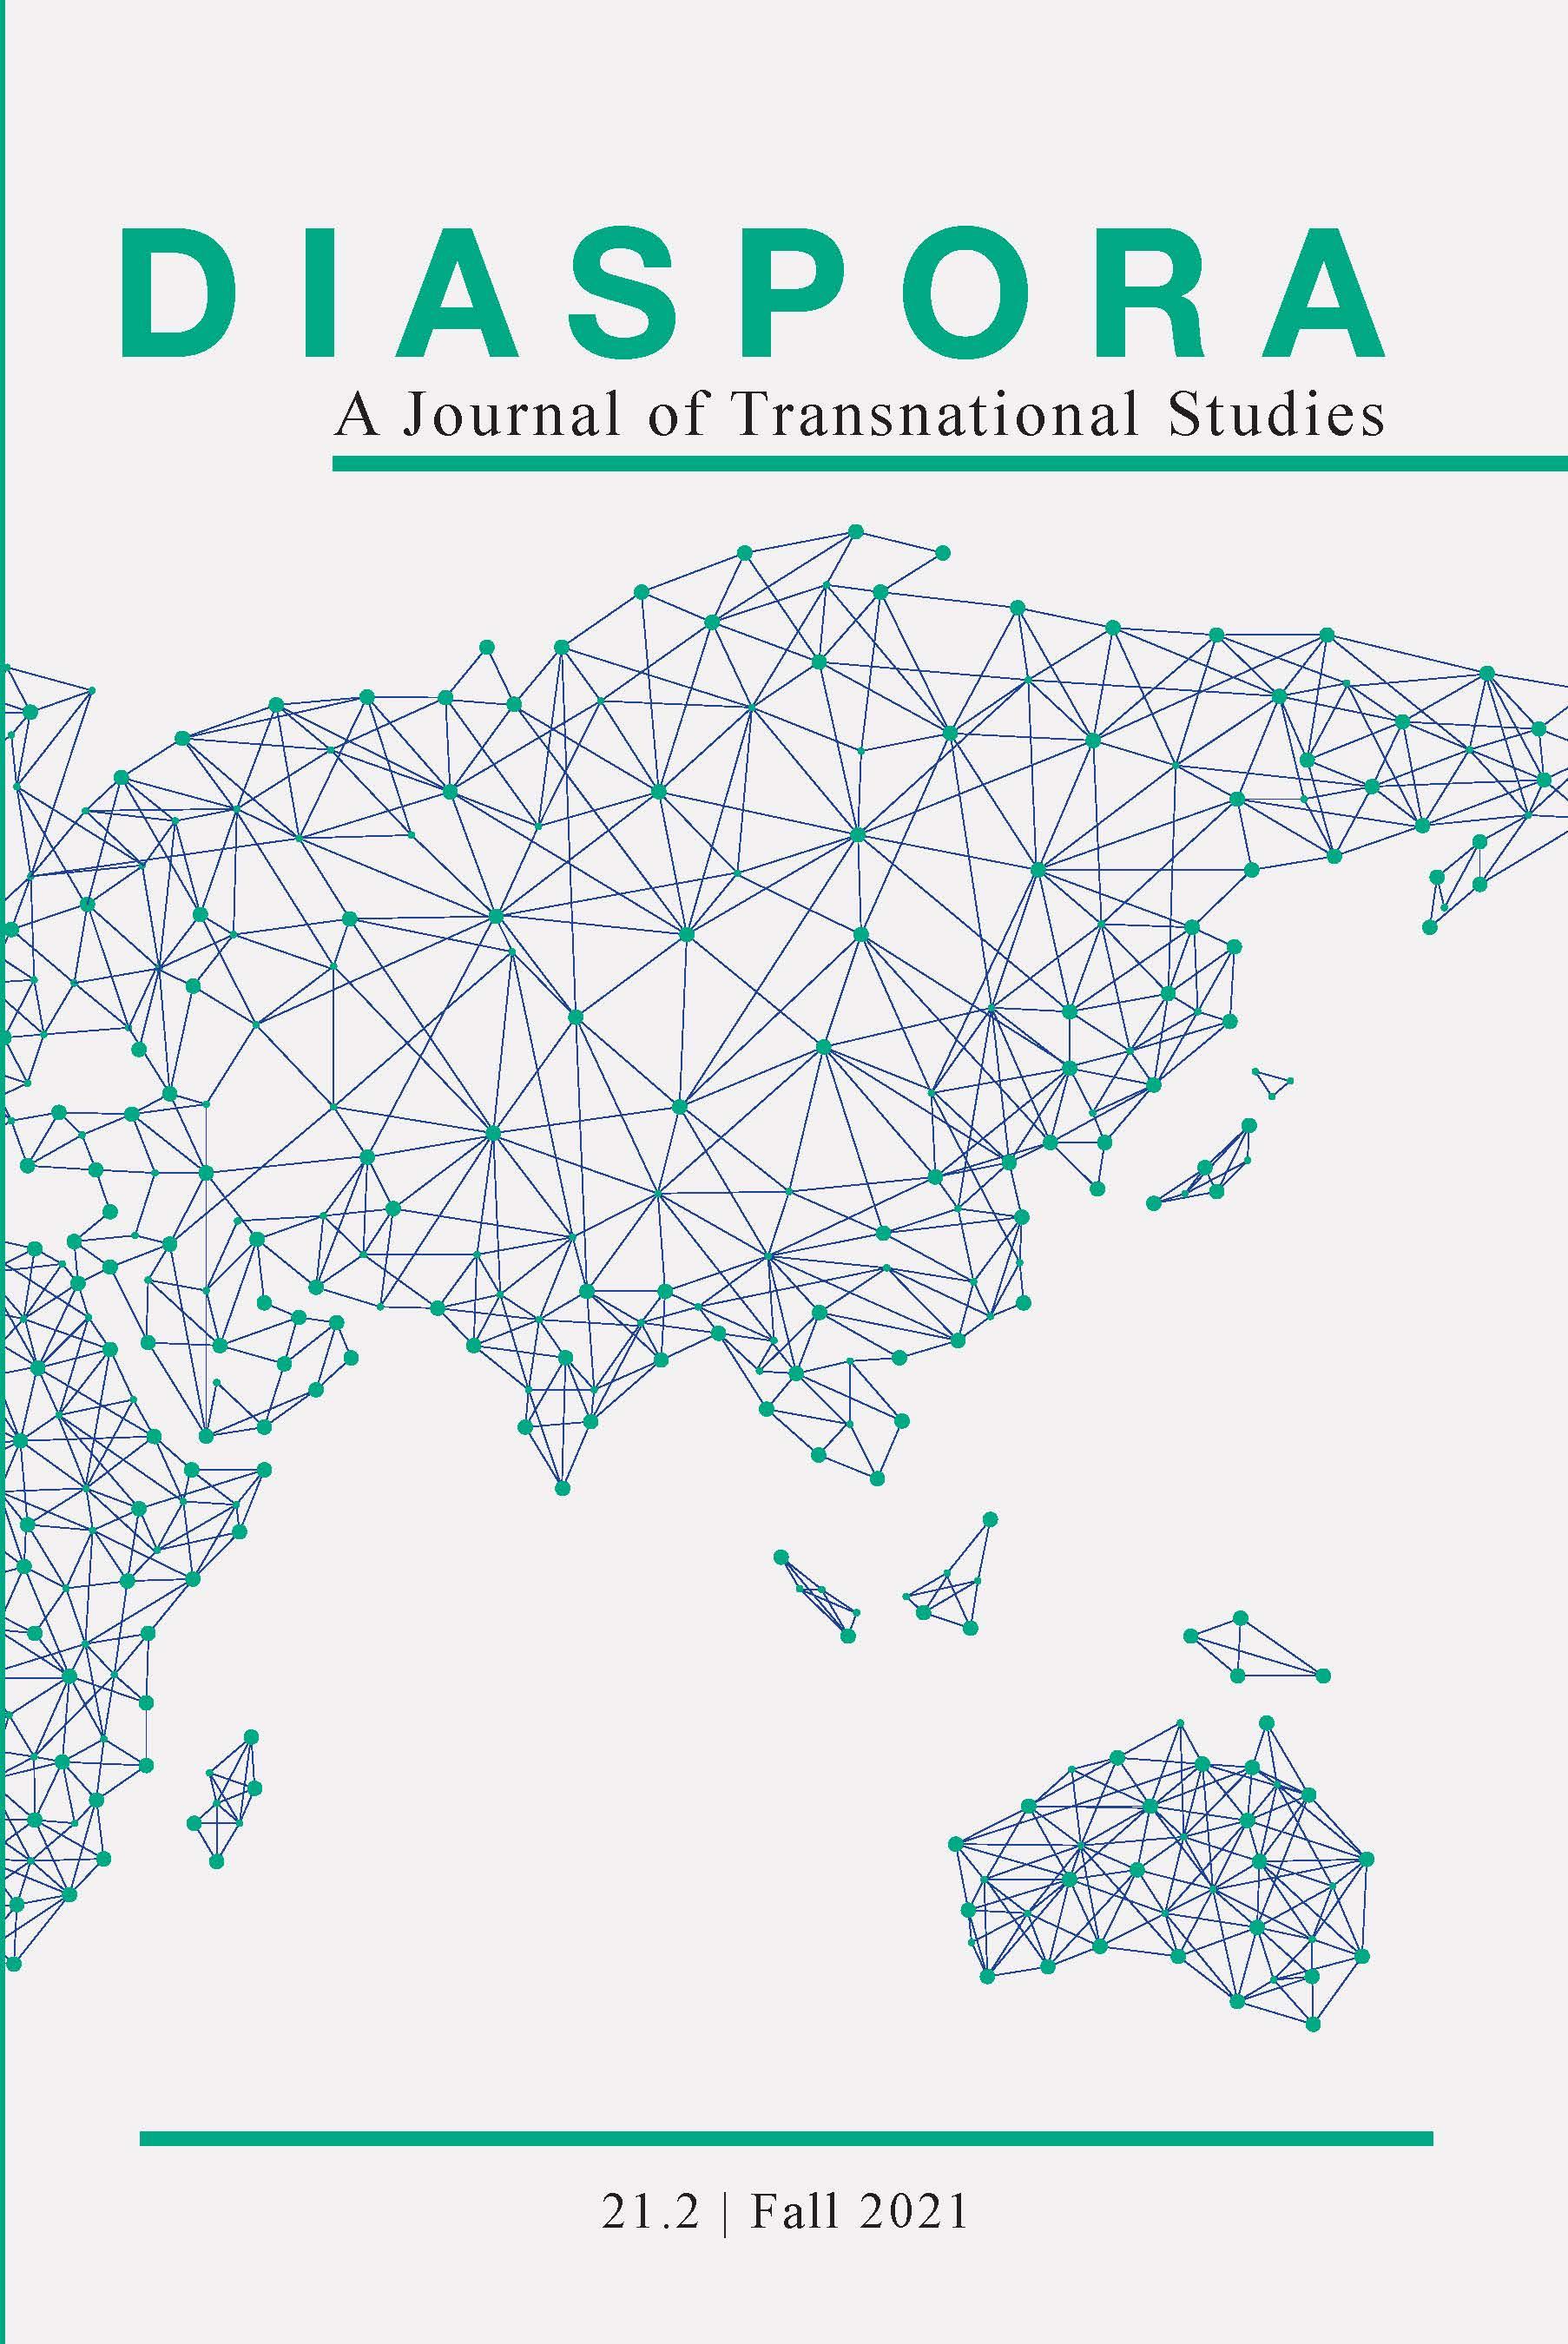 Diaspora: A Journal of Transnational Studies: Volume 21, Number 2, Fall 2021